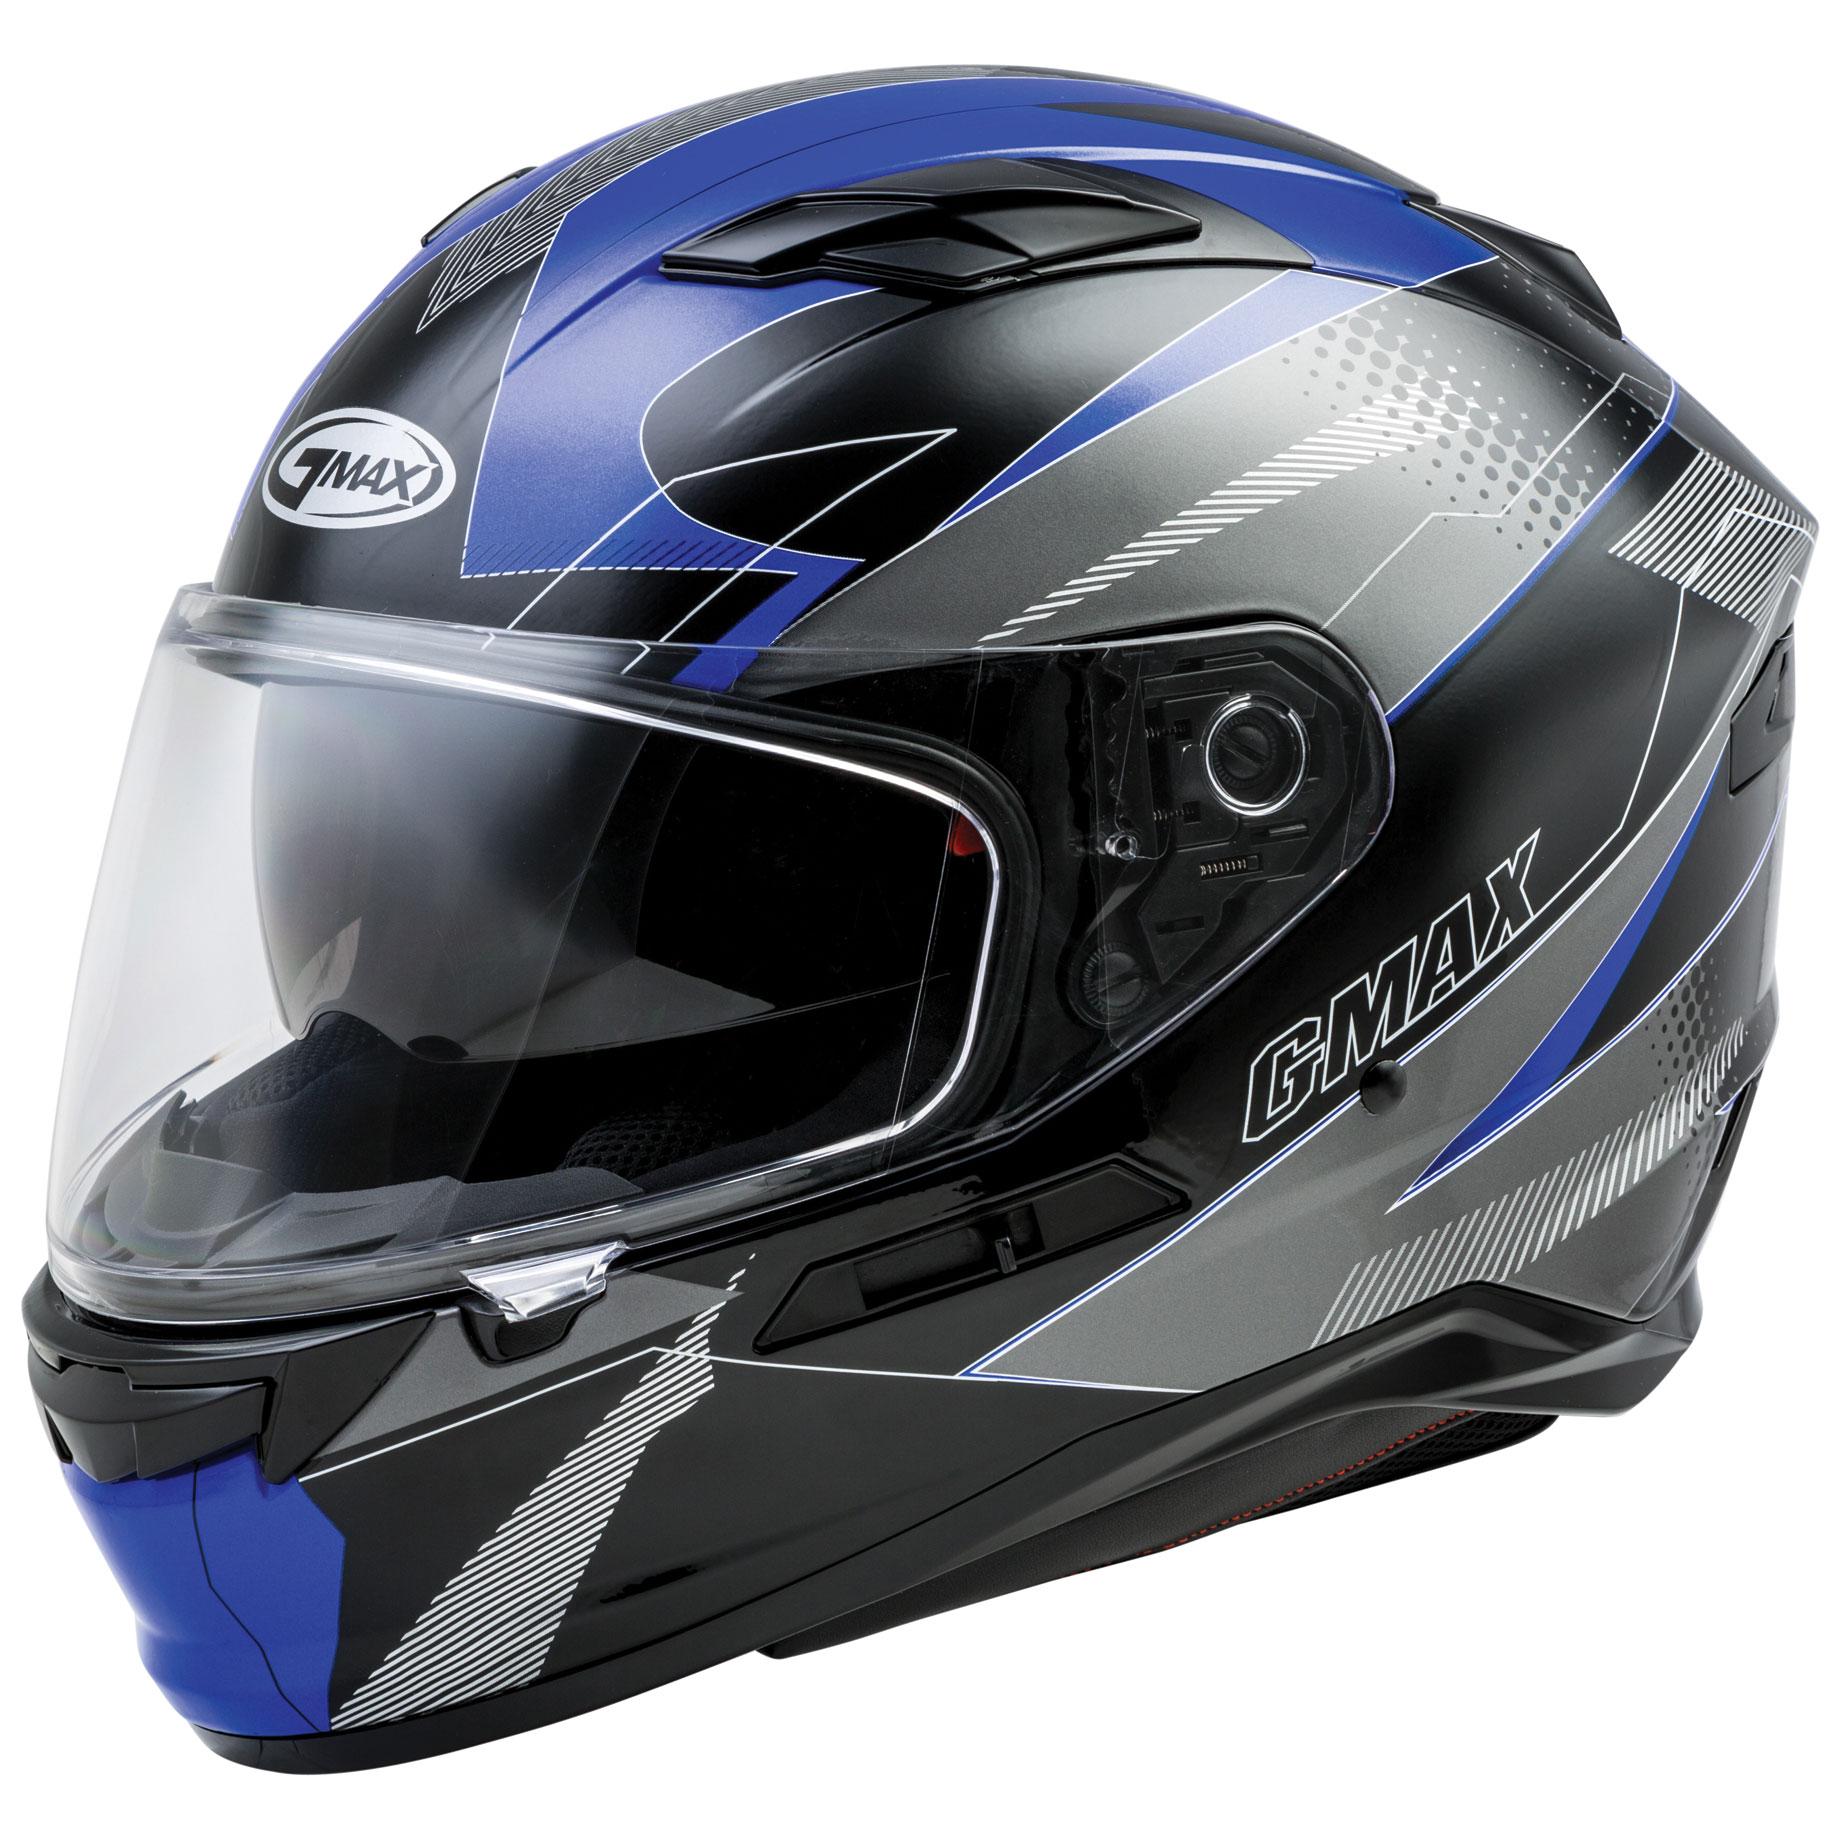 GMAX FF98 Apex Black/Blue Full Face Helmet